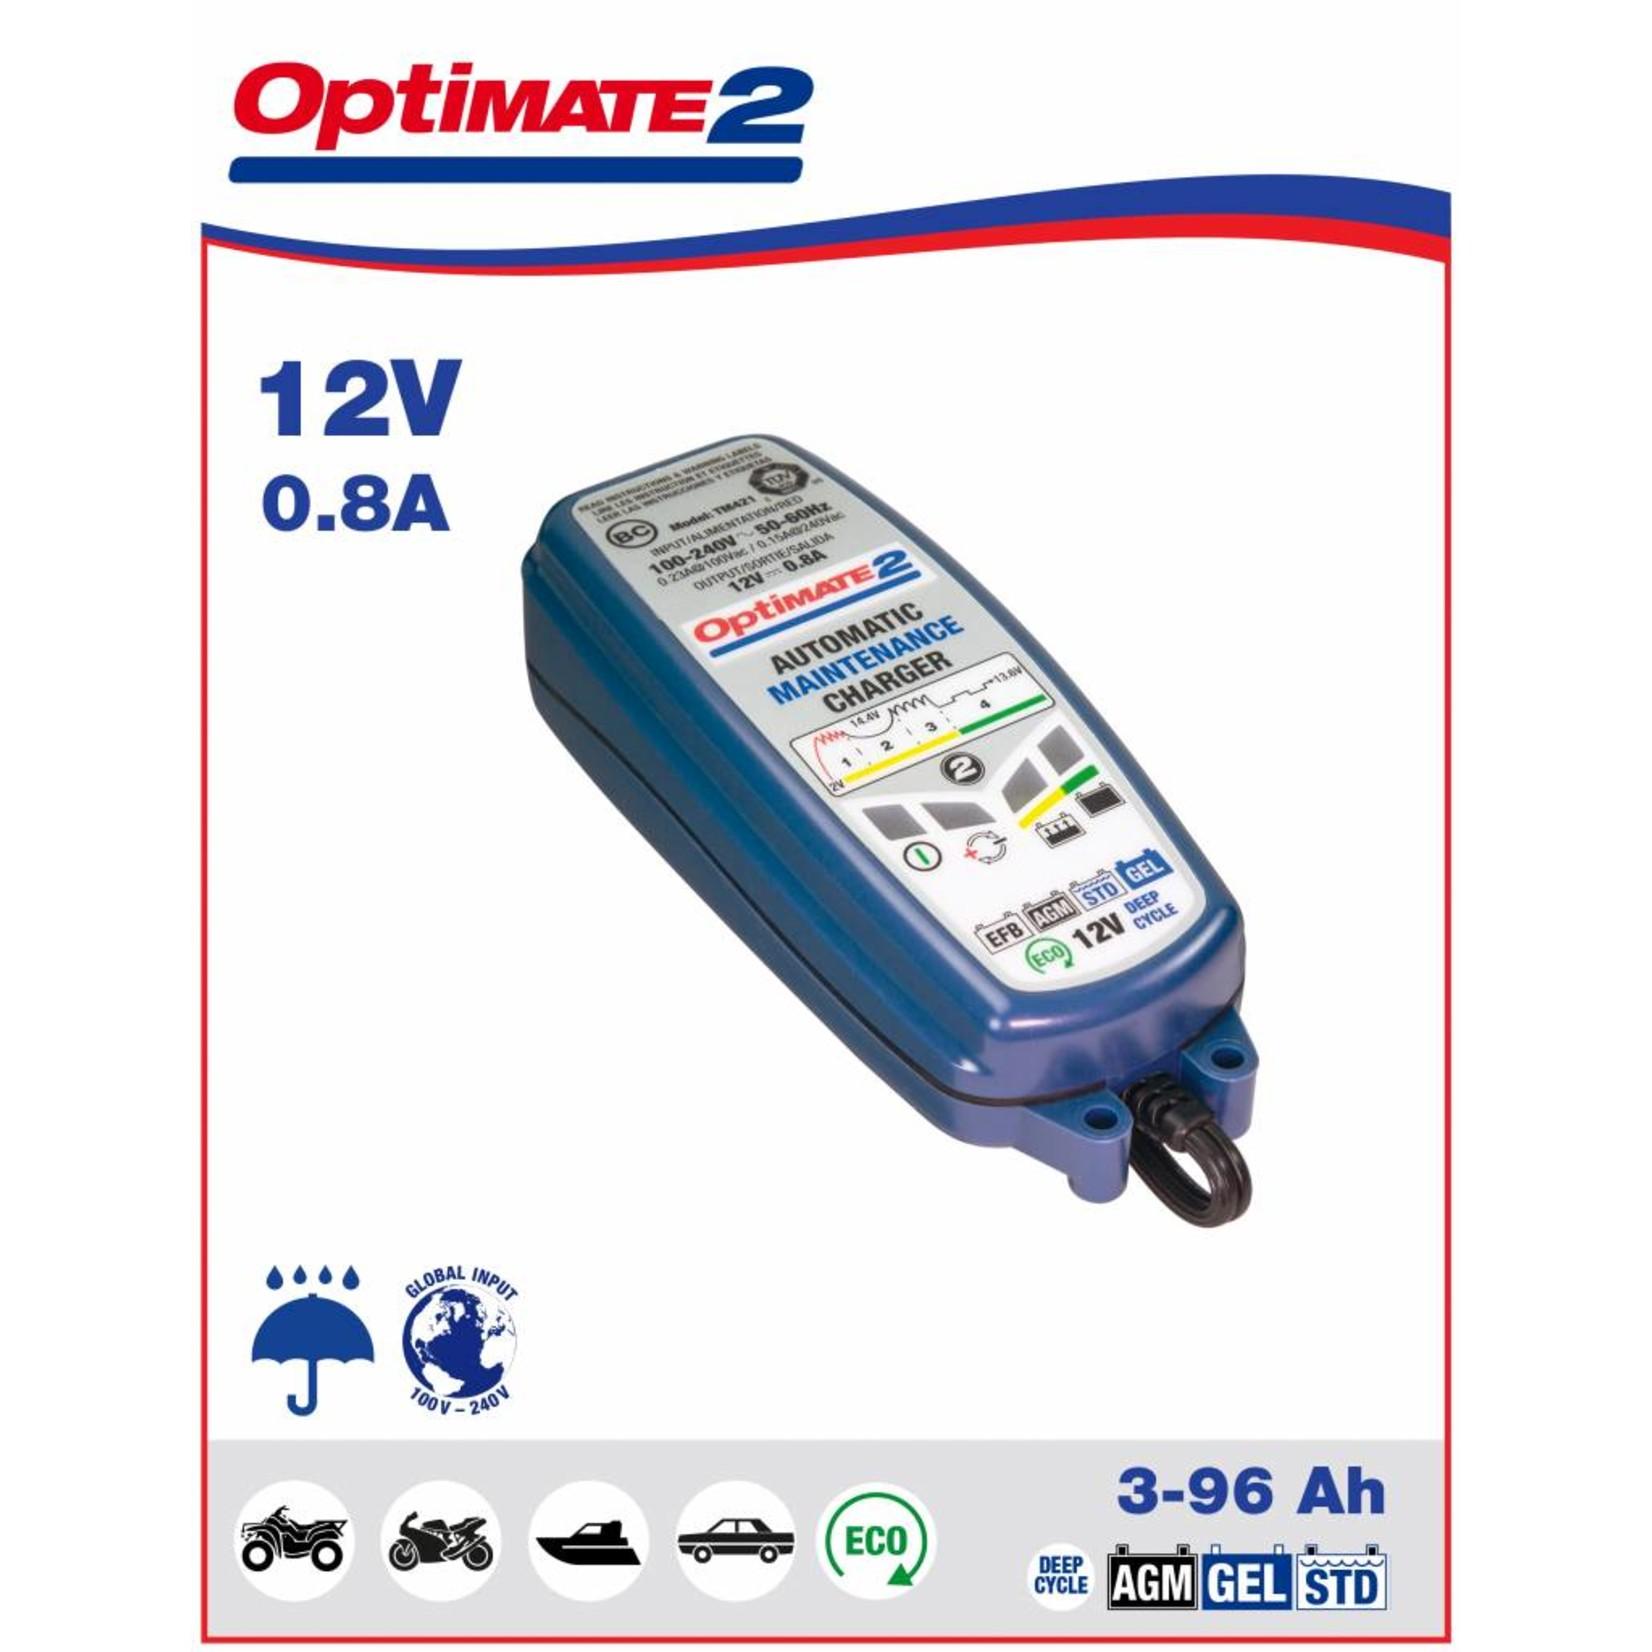 OptiMate OptiMate 2  - Battery Charger 12V